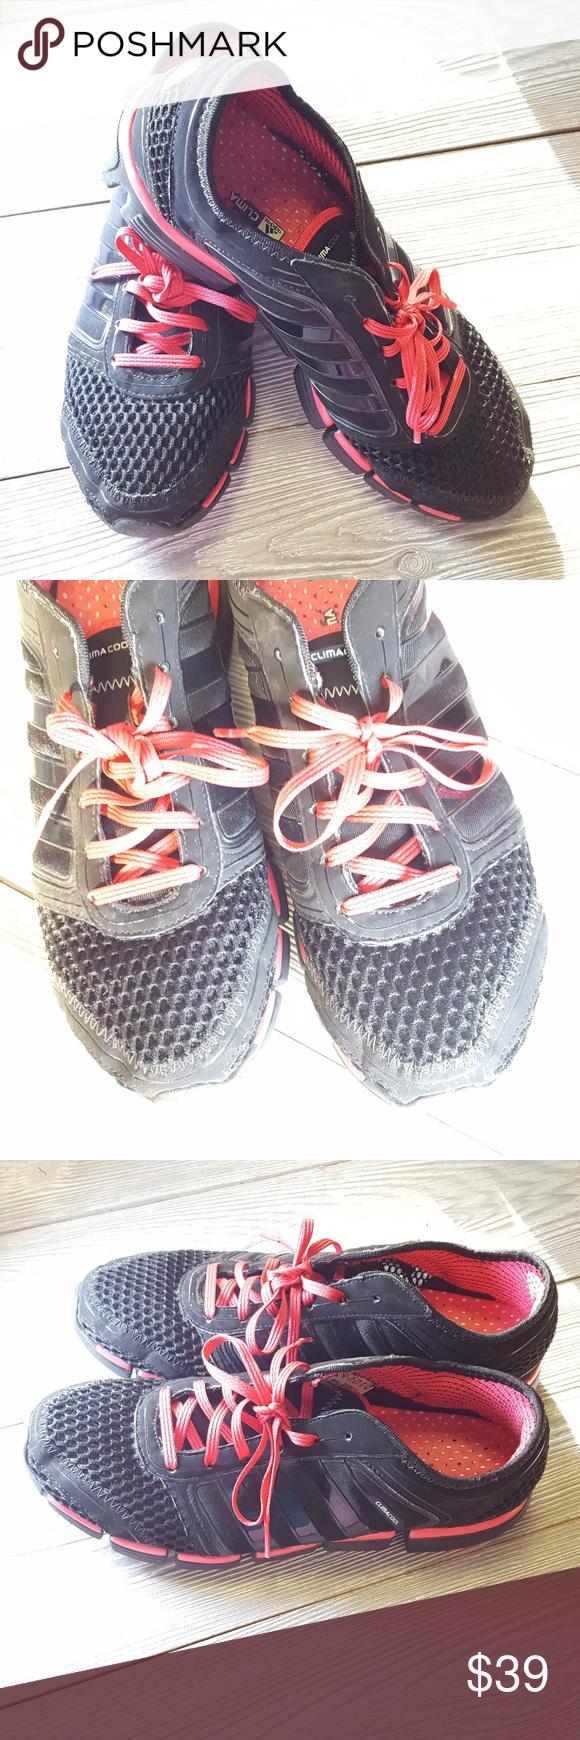 official photos c6f4a a4f7d Adidas ClimaCool Running Shoes G47274 black 10 Adidas ClimaCool Running  Shoes G47274 oscillation Zigzag sole black